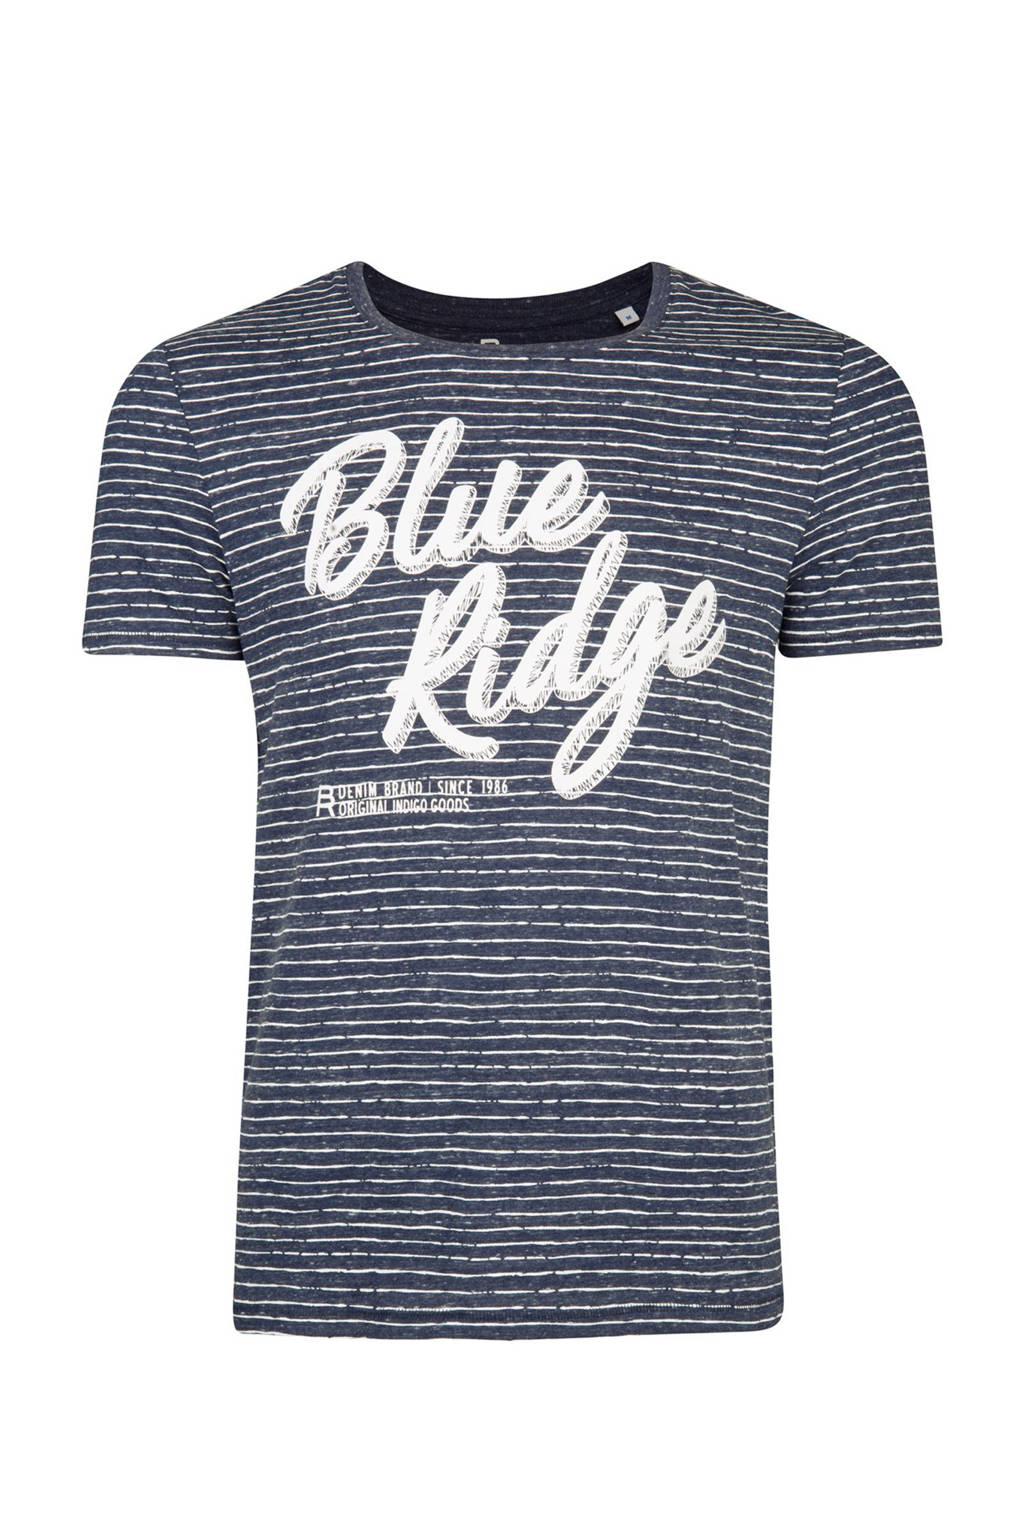 WE Fashion Blue Ridge gestreept slim fit T-shirt marineblauw, Marineblauw